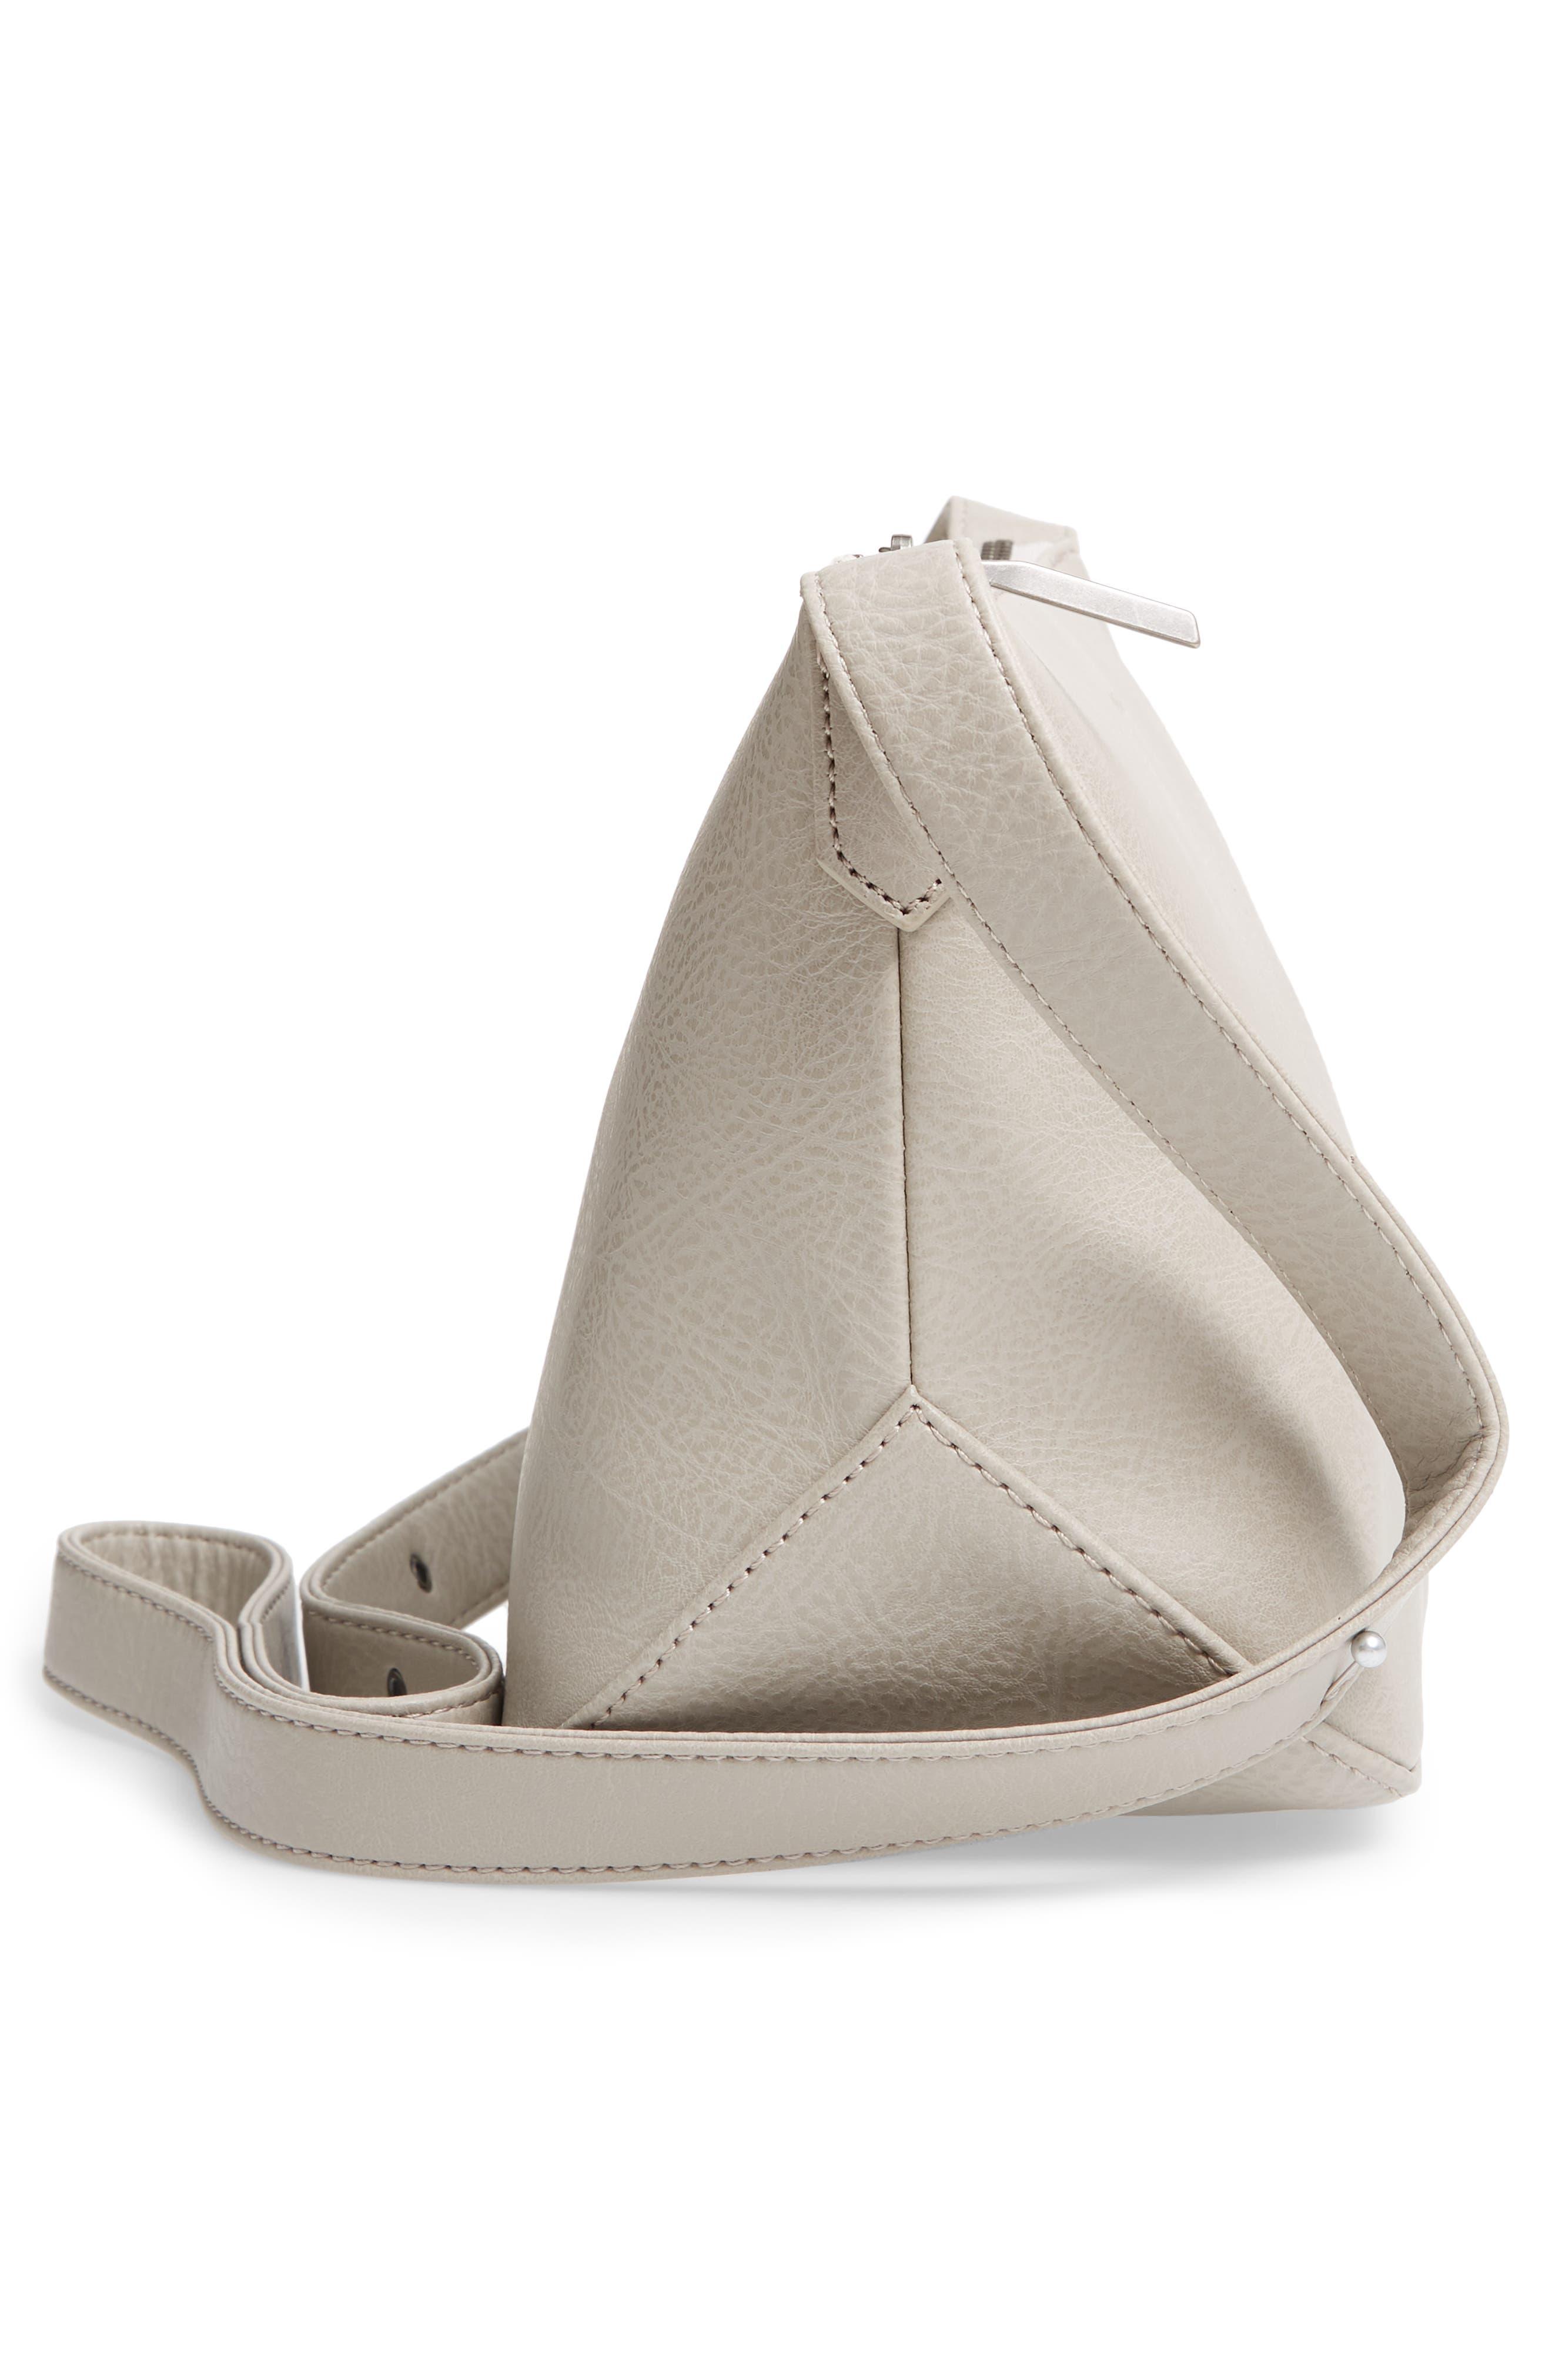 Large Sam Faux Leather Crossbody Bag,                             Alternate thumbnail 5, color,                             050